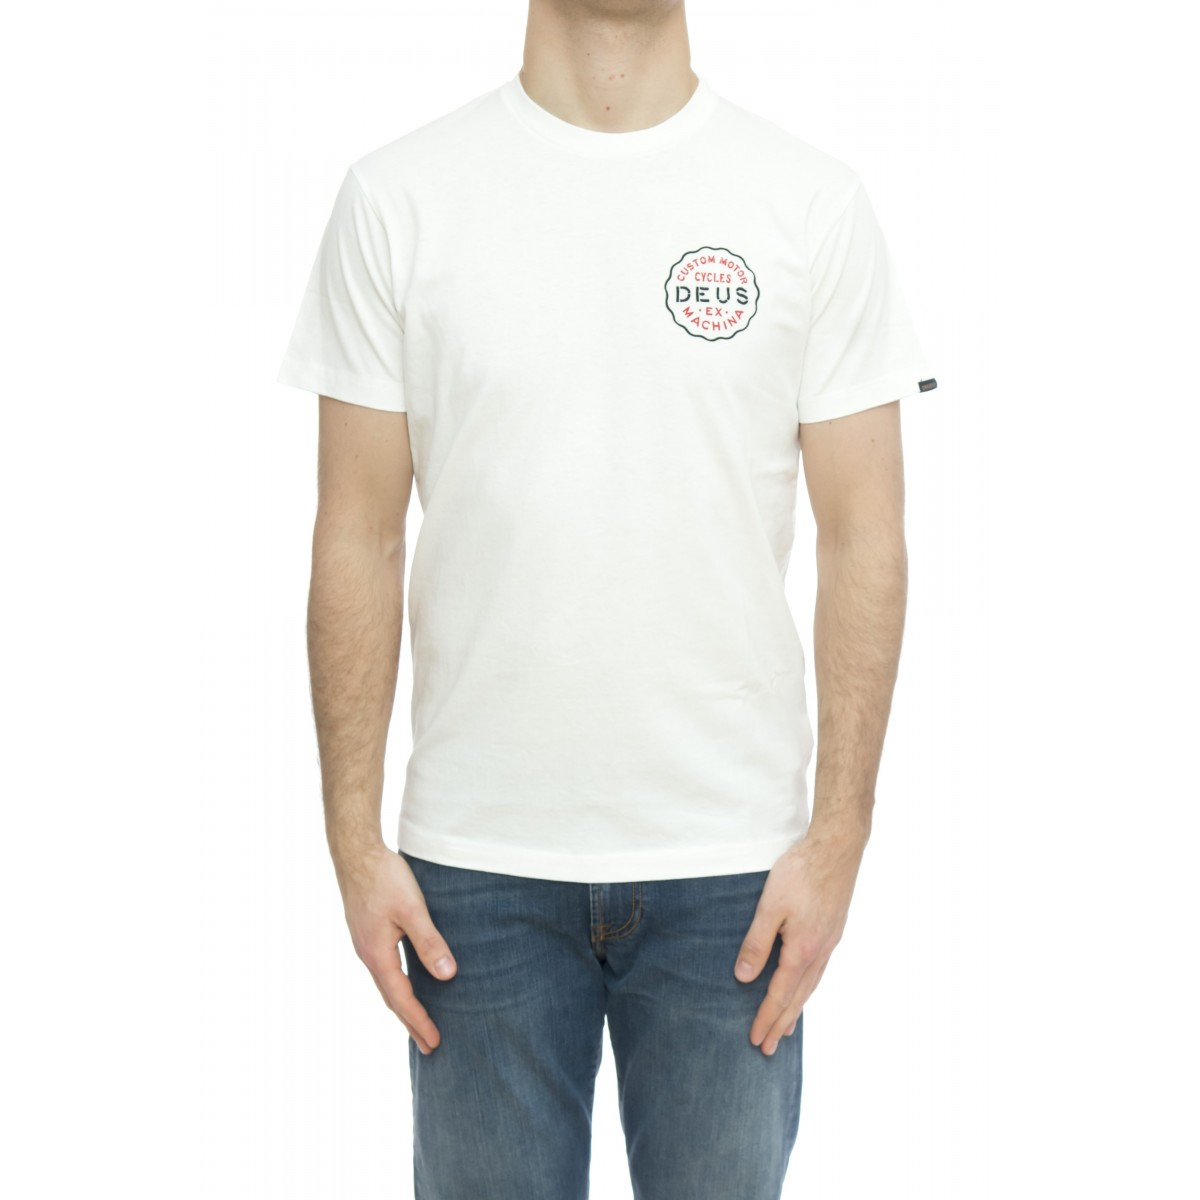 T-shirt - Tee0352 t-shirt ricamo